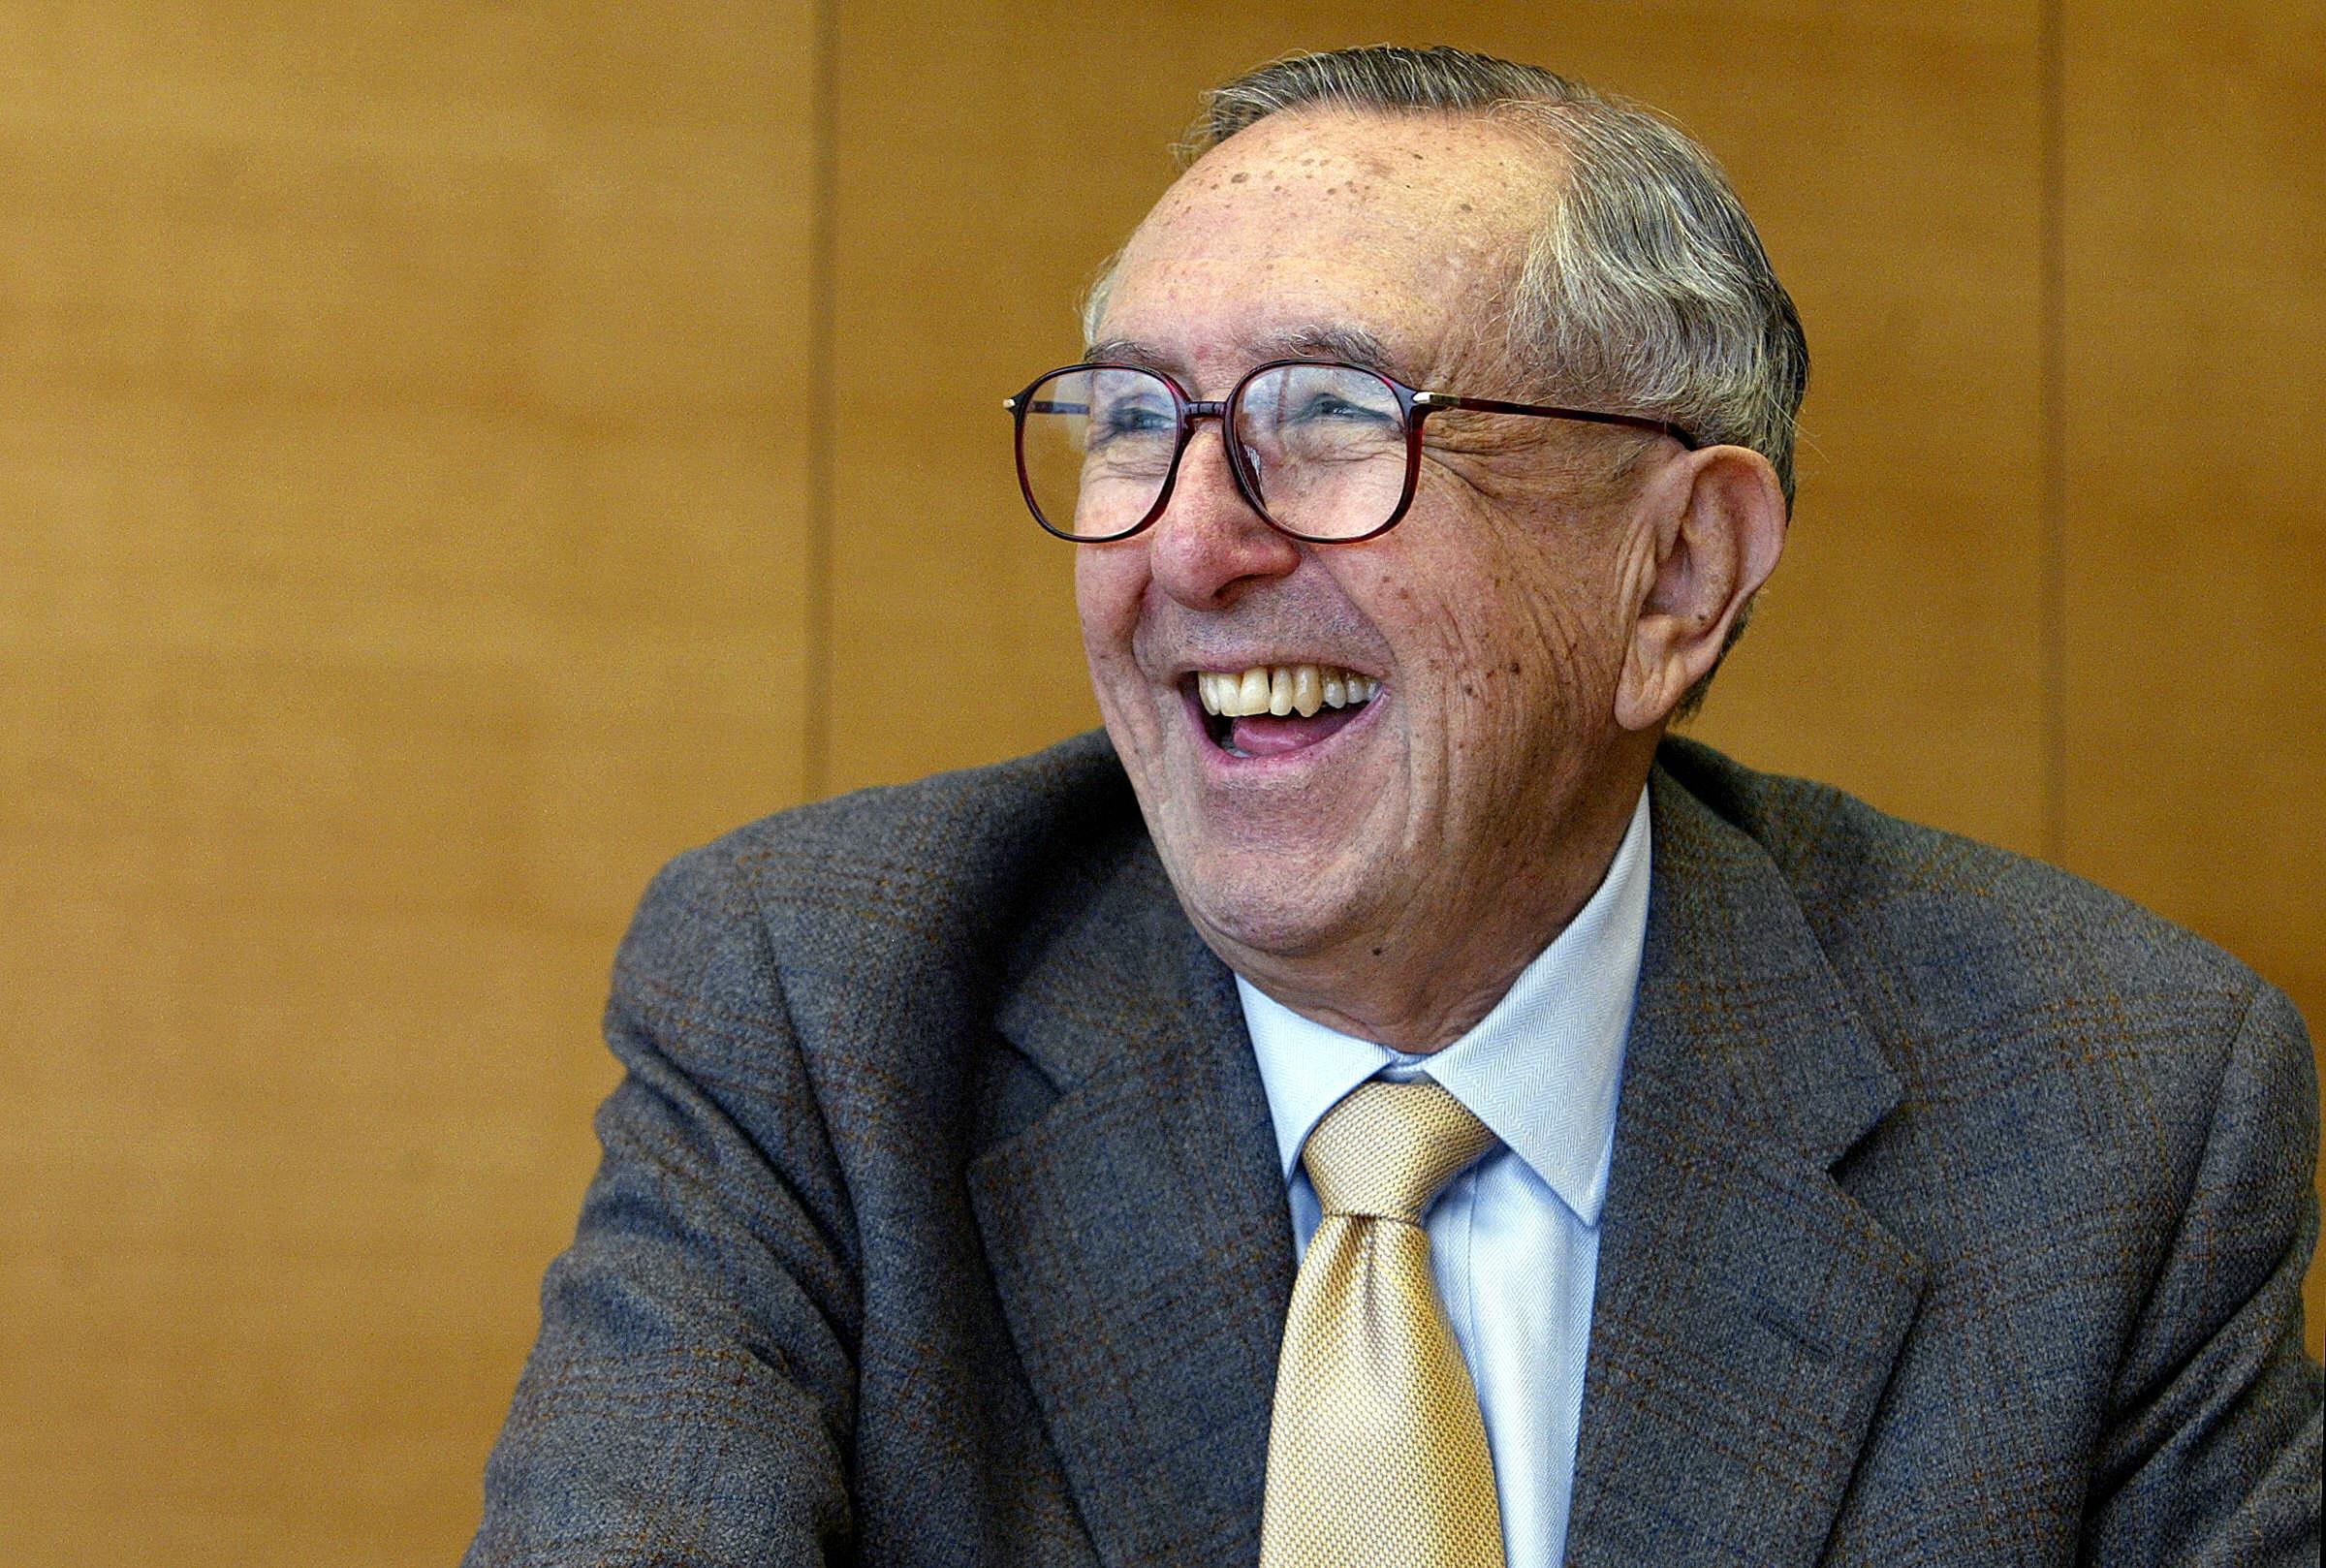 Argentinian architect Cesar Pelli smiles